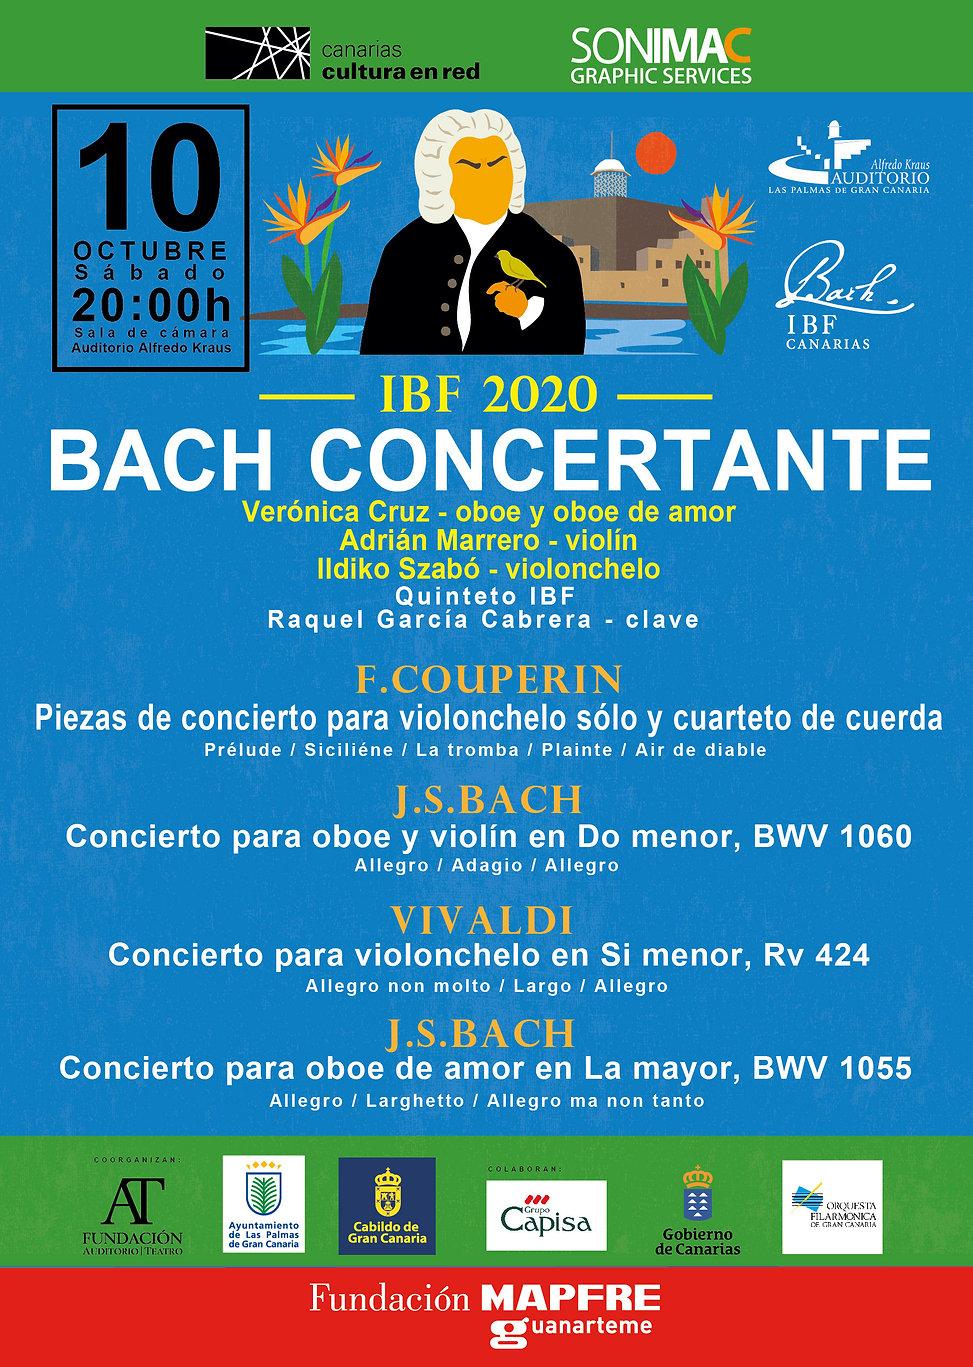 programa_concertante_10_148x210.jpg